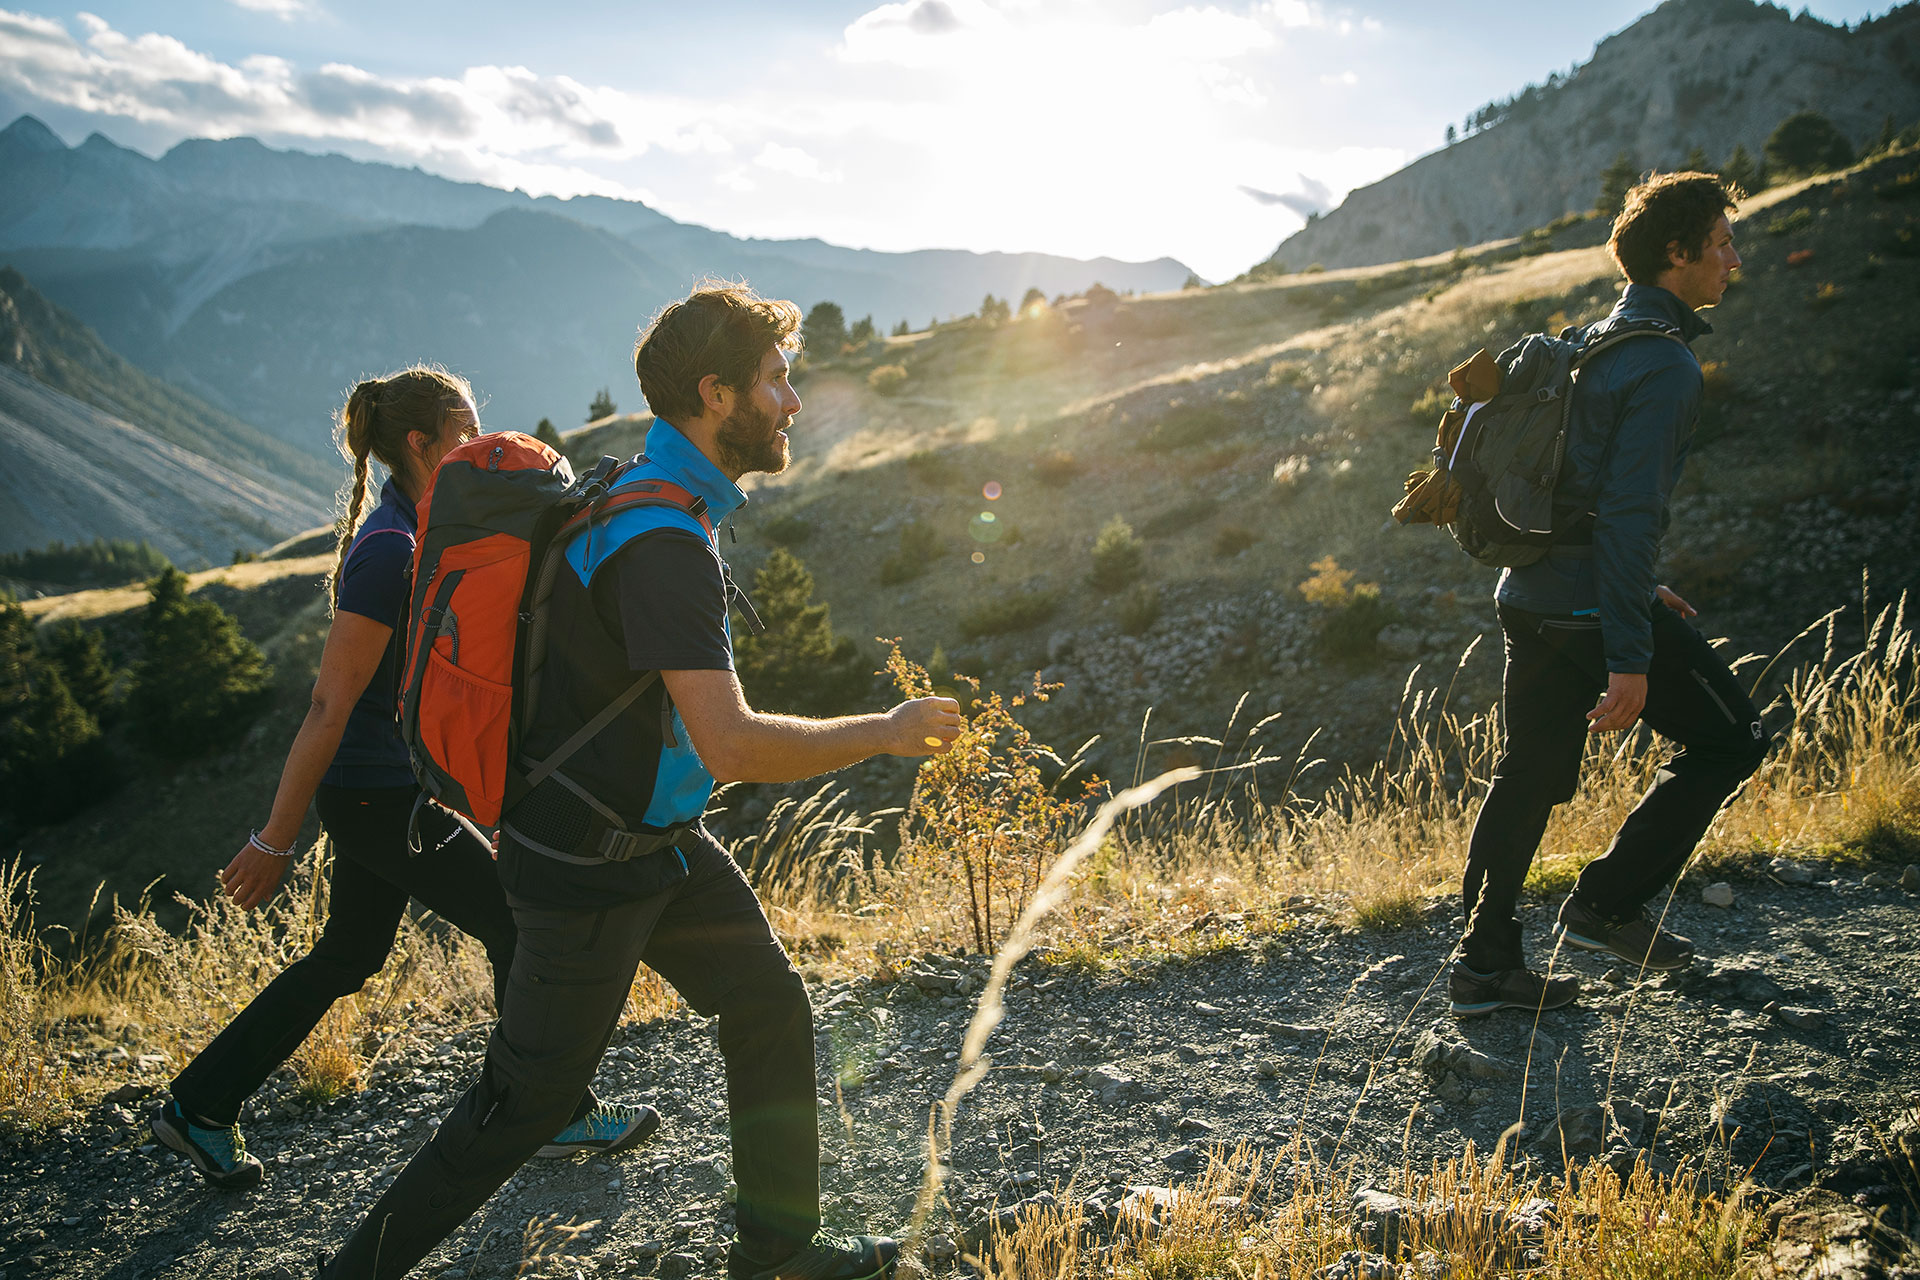 Paris Frankreich Wandern Outdoor Fotograf Sport Fitness Trekking Katalog Fotoproduktion